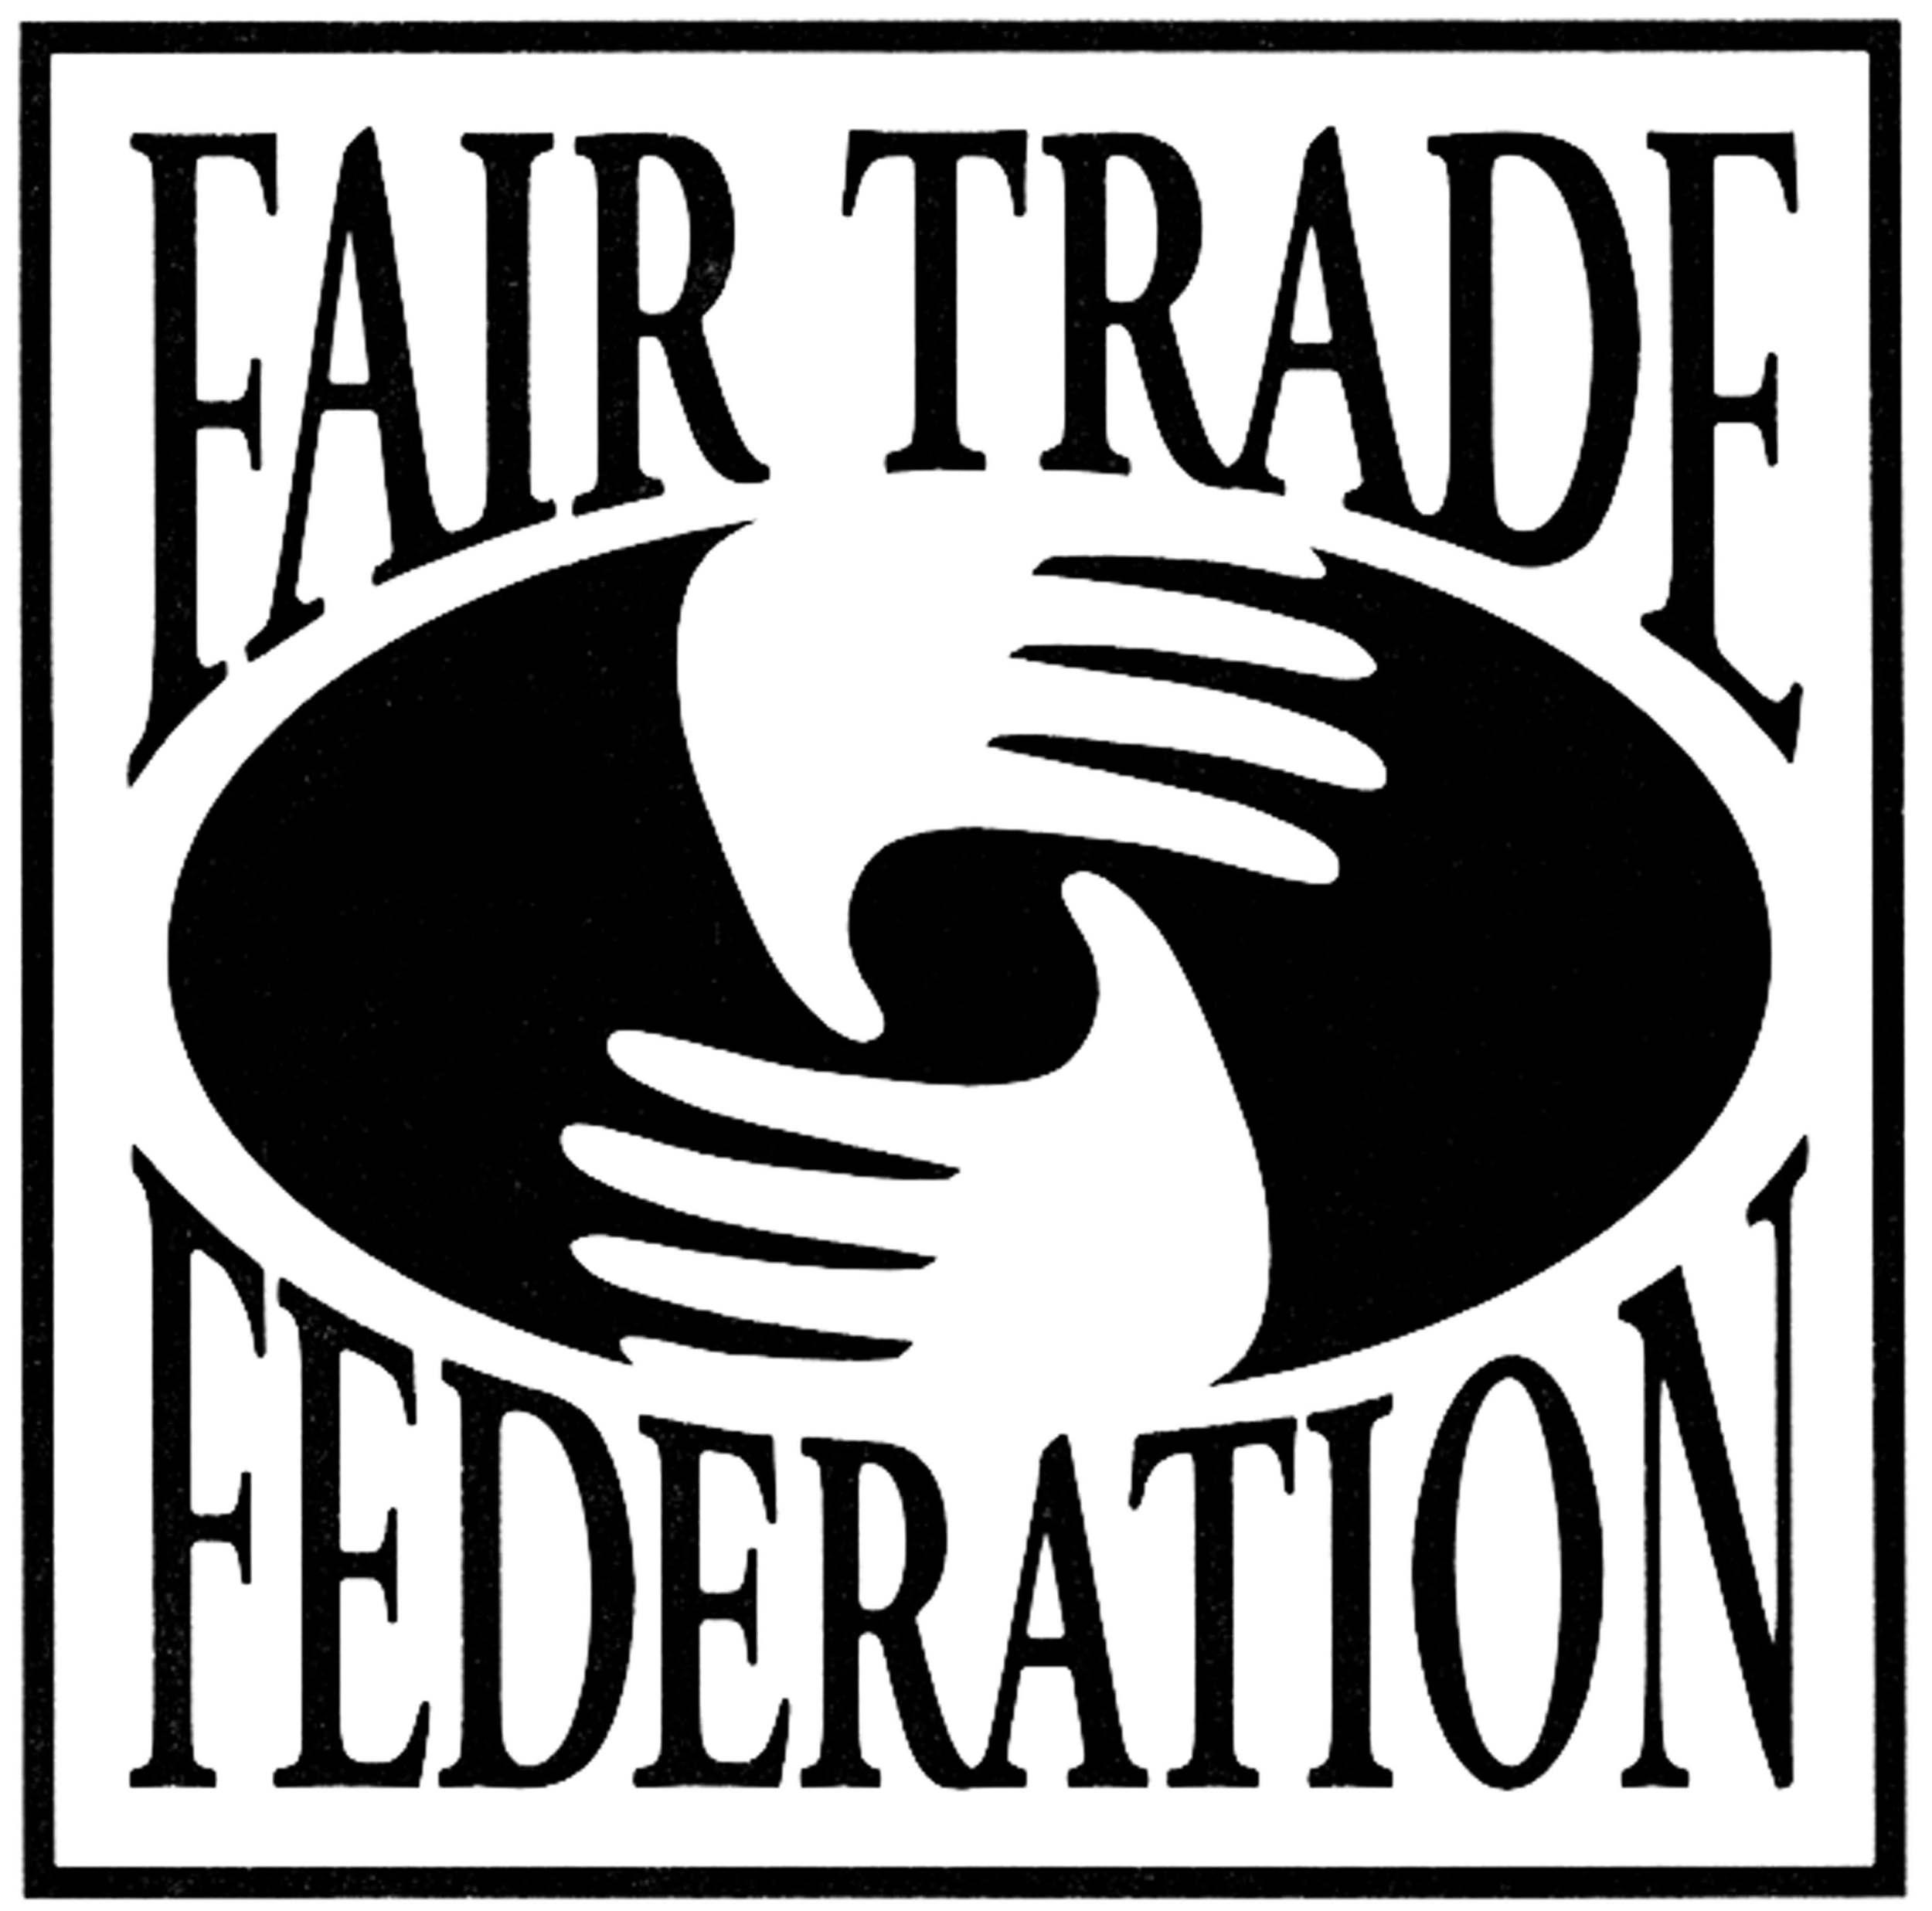 Fair Trade Federation.jpeg